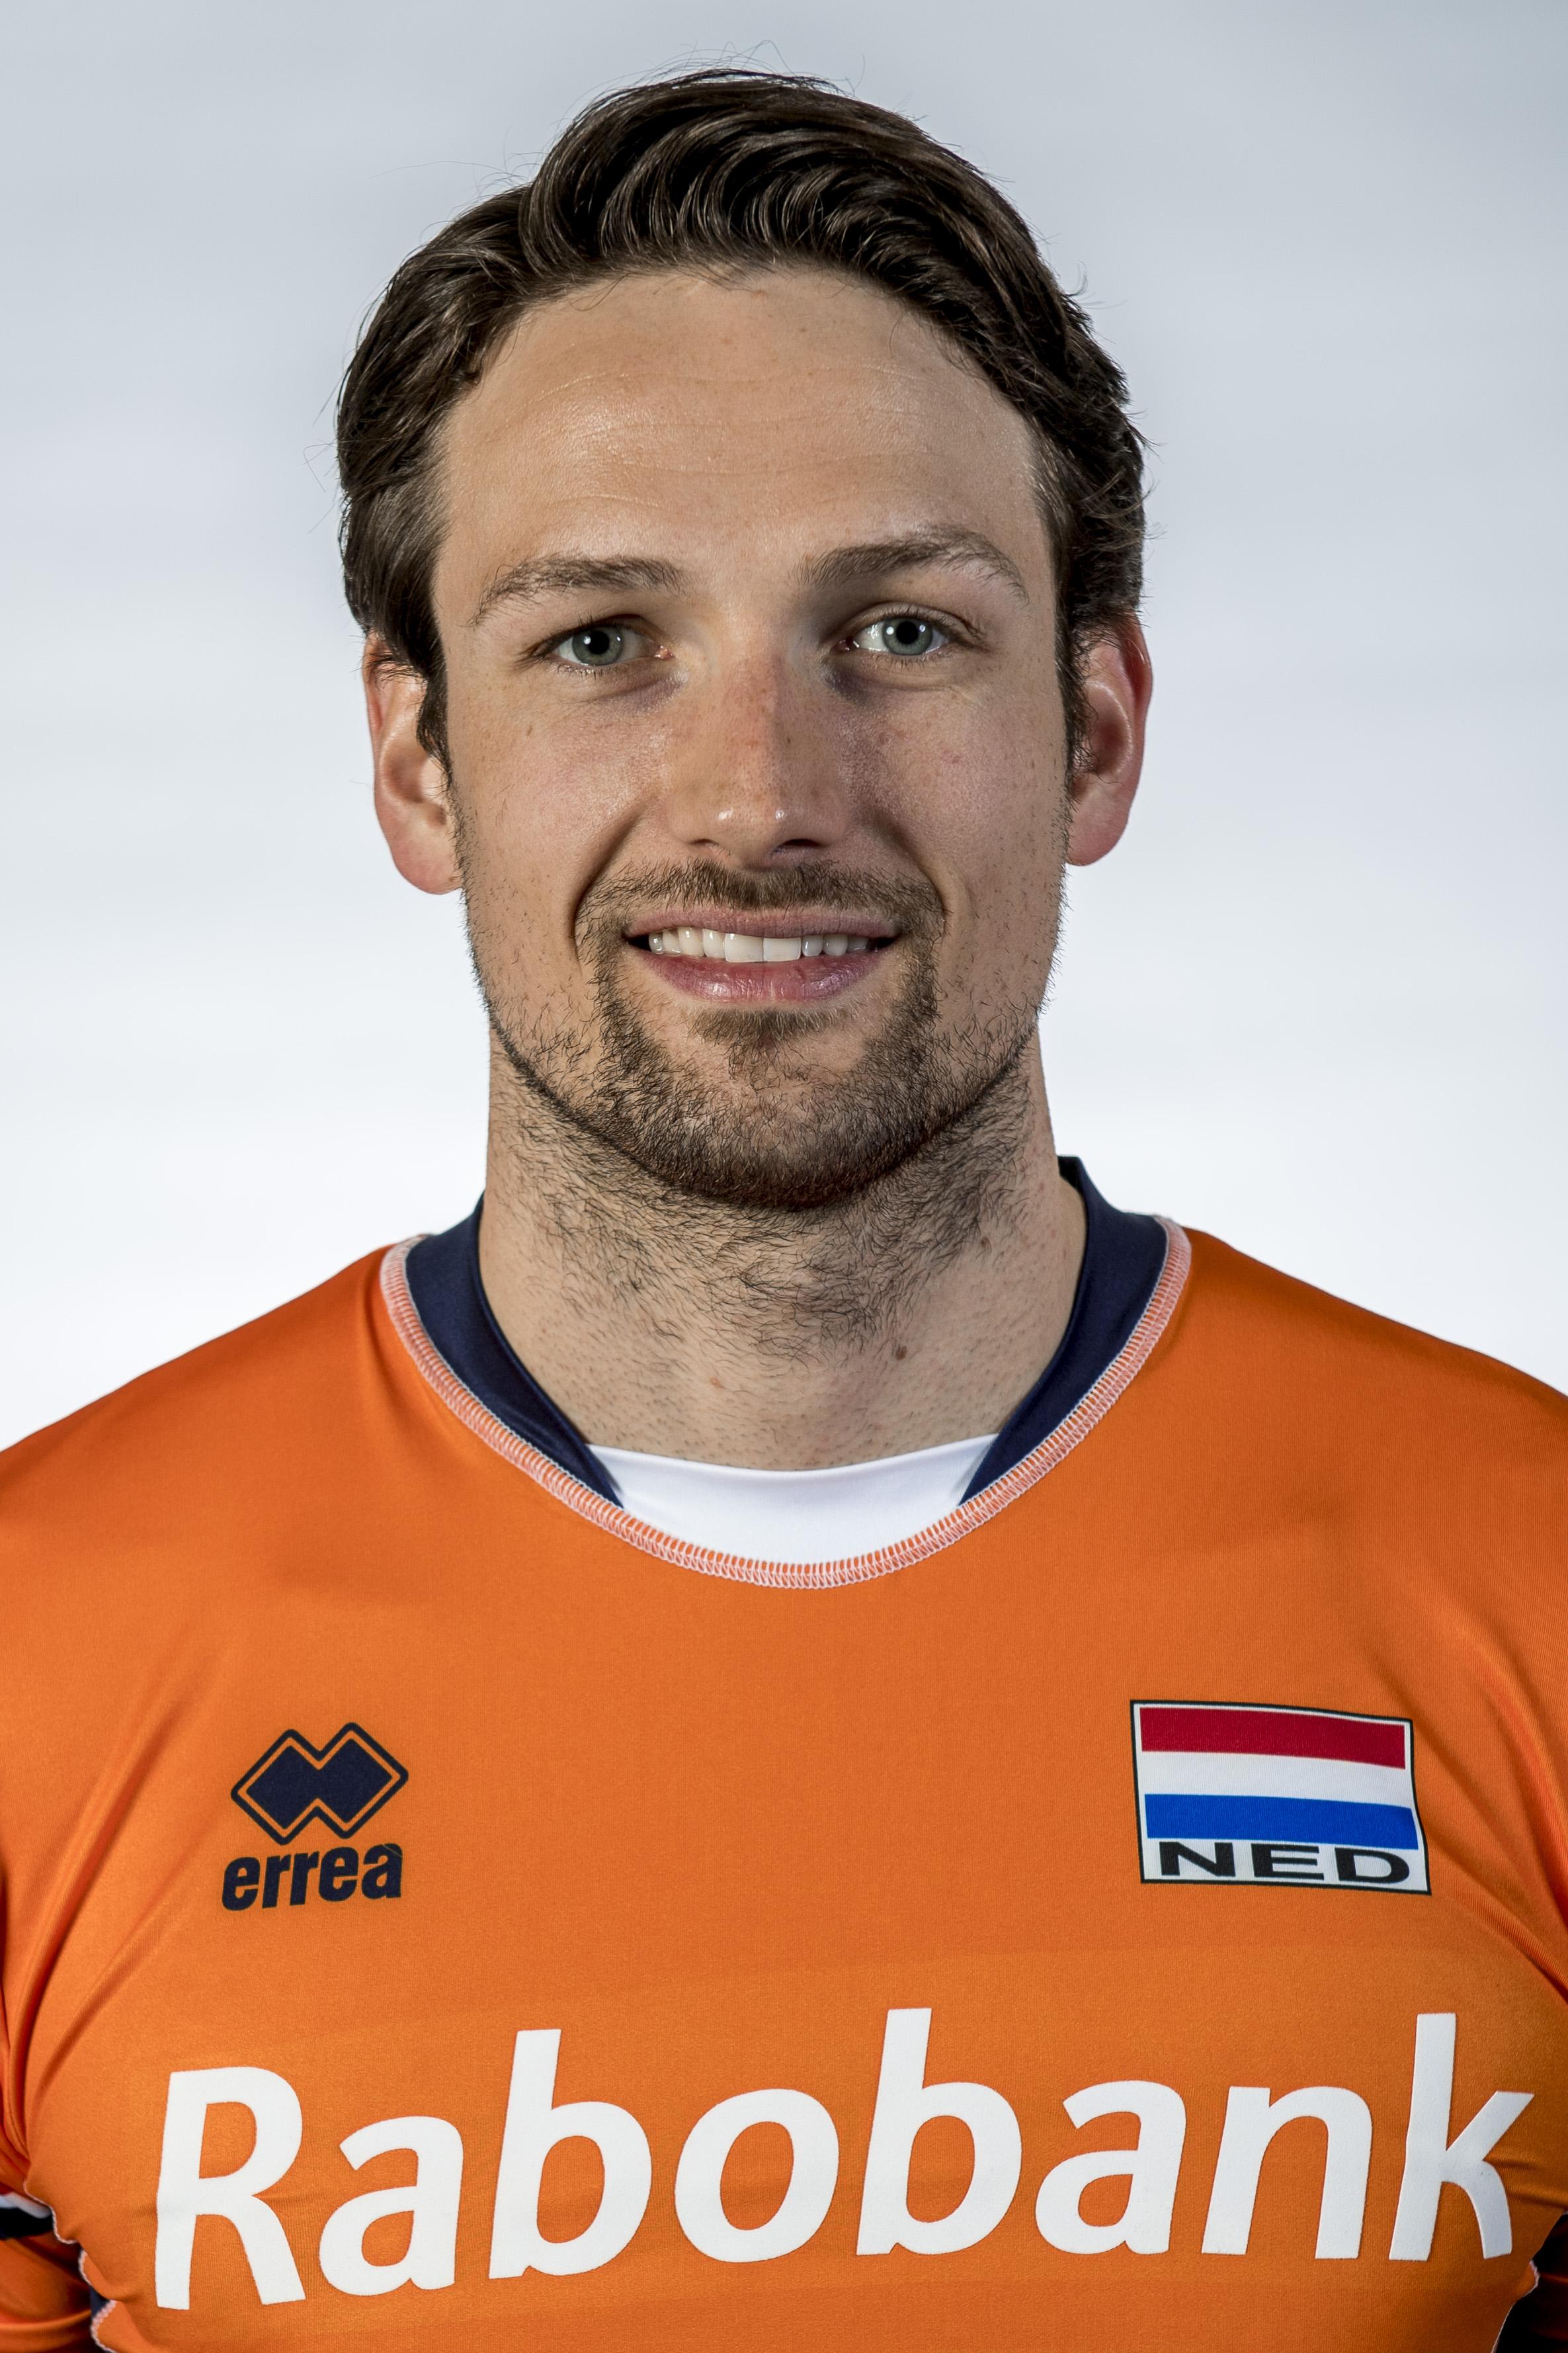 Thomas Koelewijn